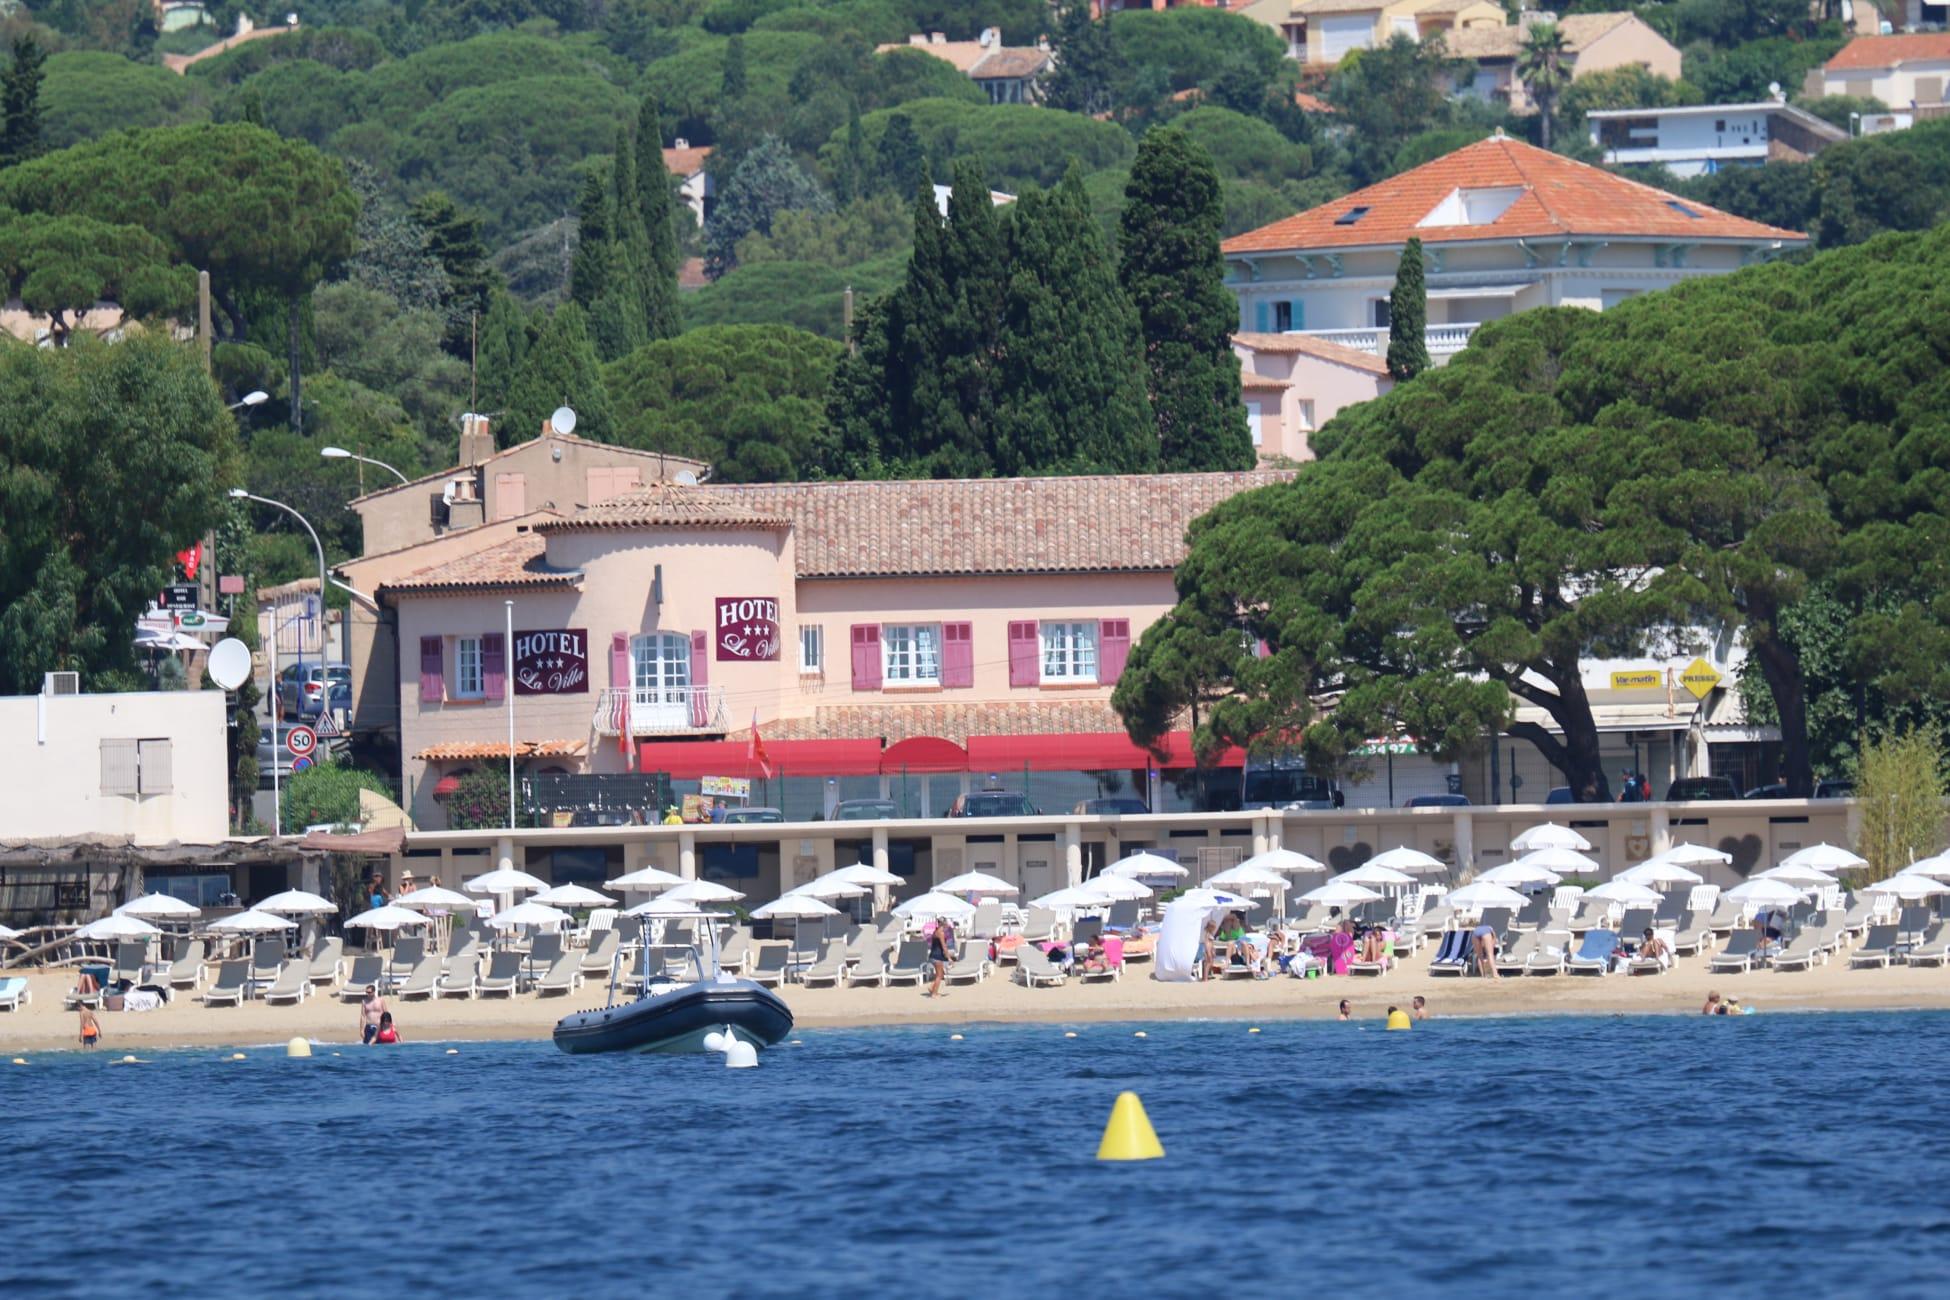 Otel Hotel La Villa, Sainte-Maxime - Trivago.tr pour Hotel Les Jardins De Sainte Maxime